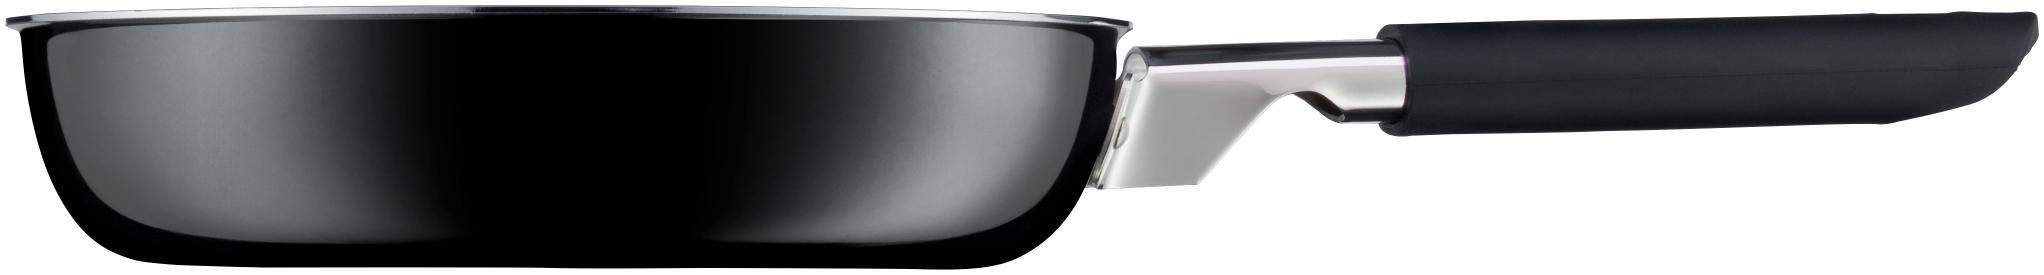 WMF Fusiontec Tava 20 cm Siyah